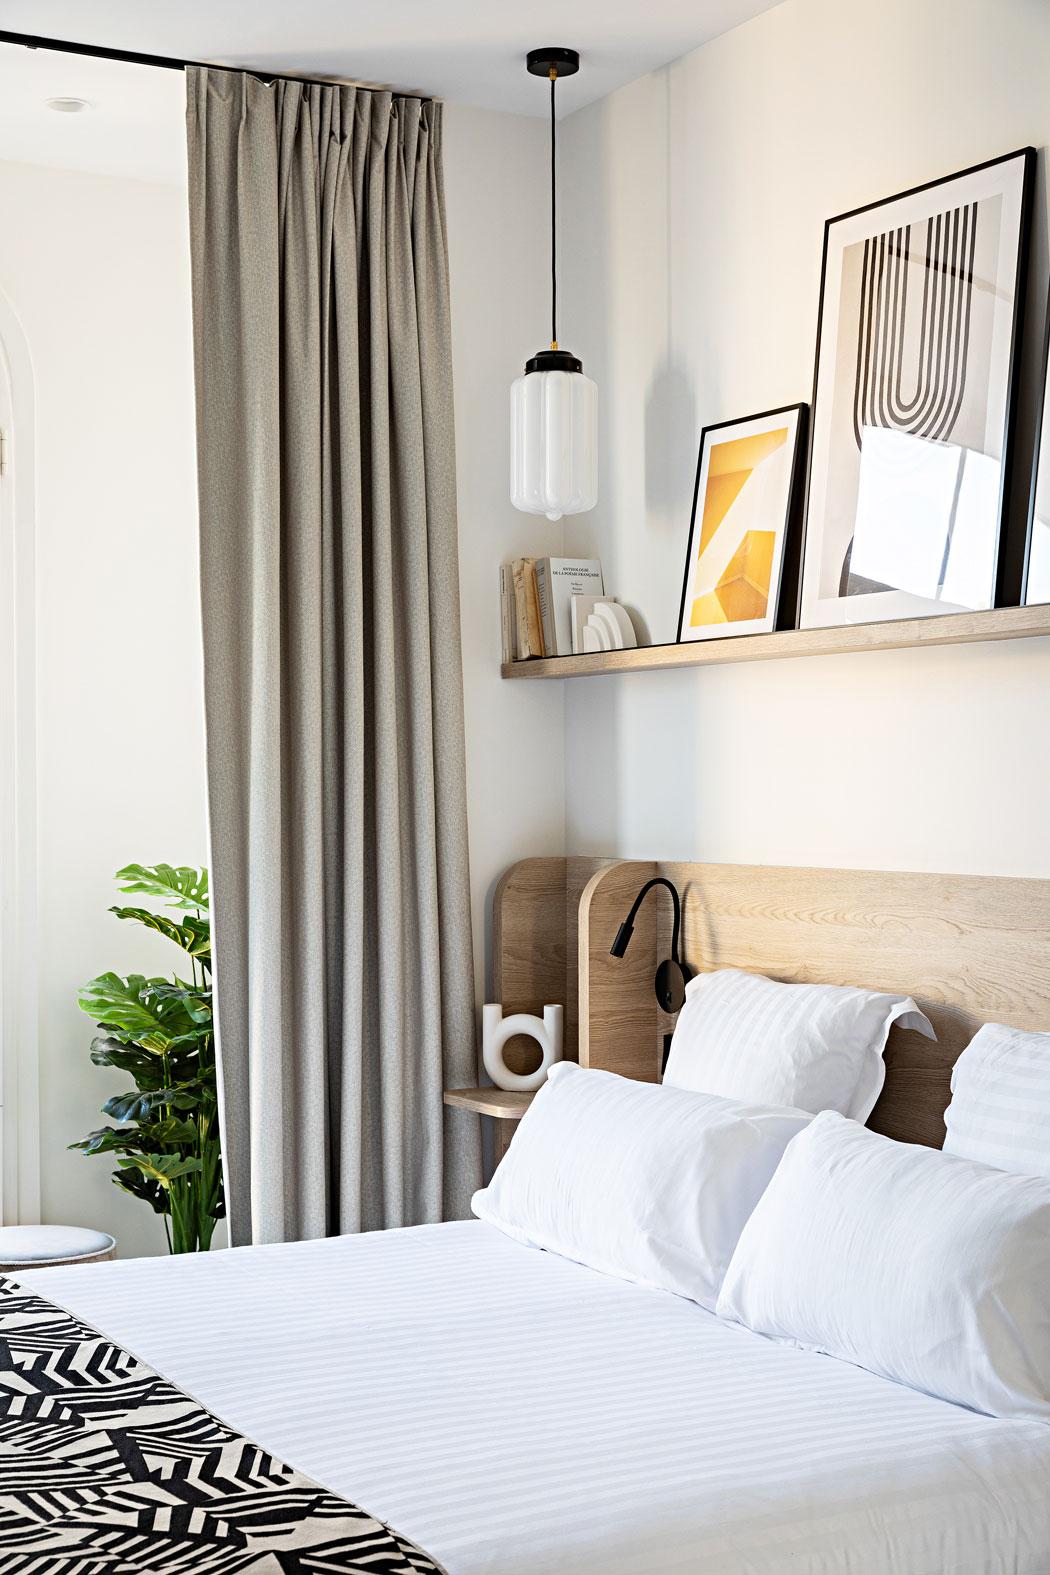 Hotel Riviera Collection - Chambre